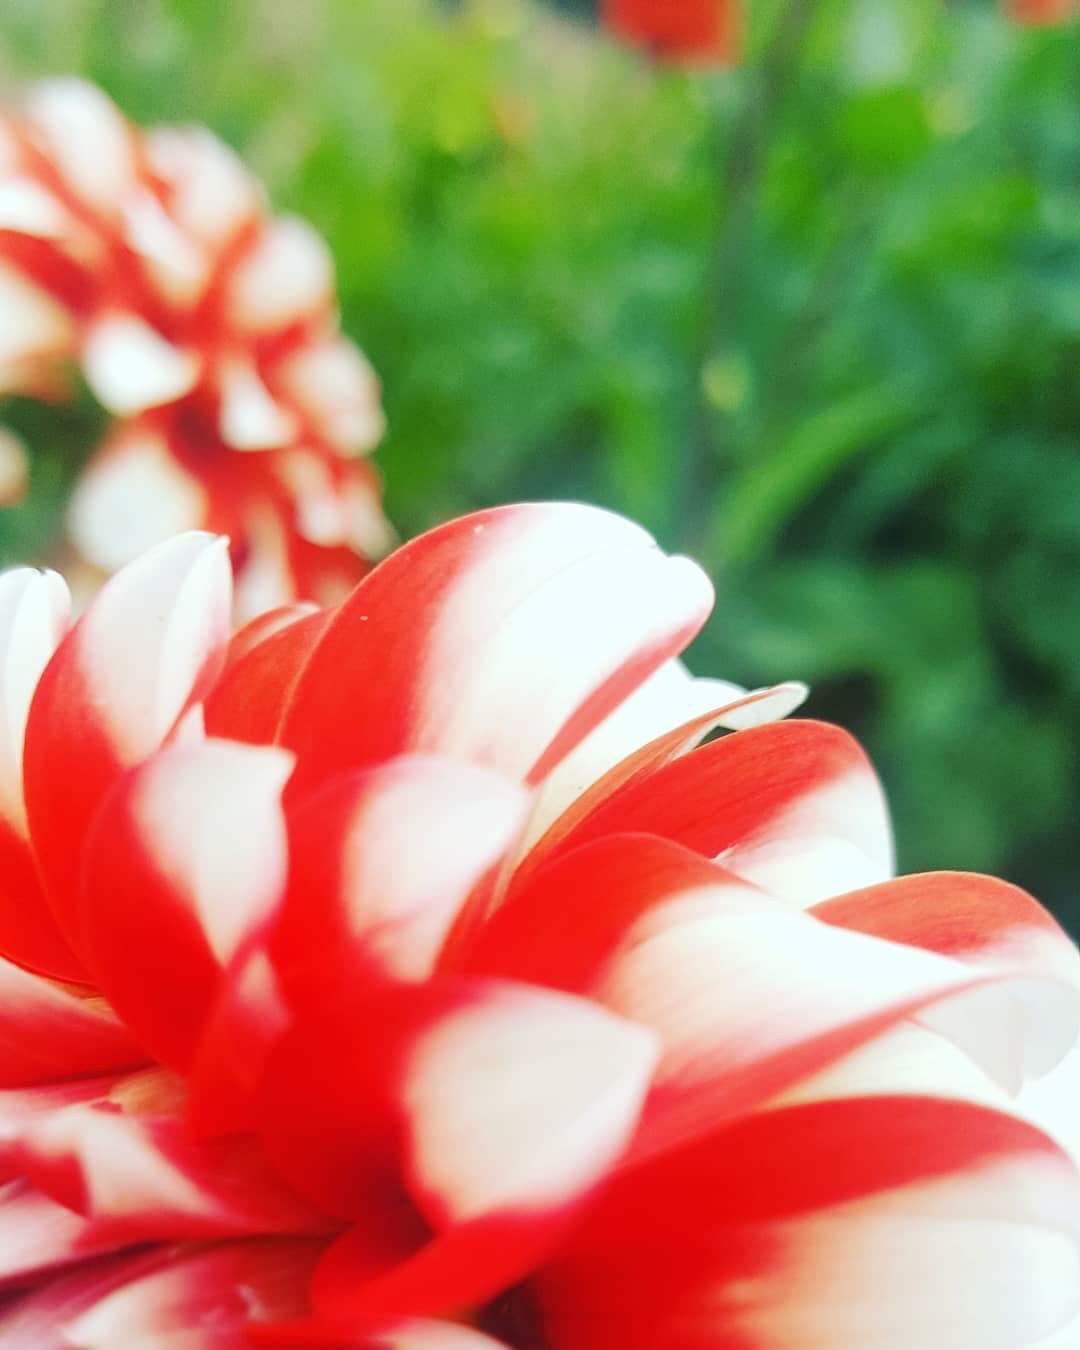 Red & White Dahlia Flower